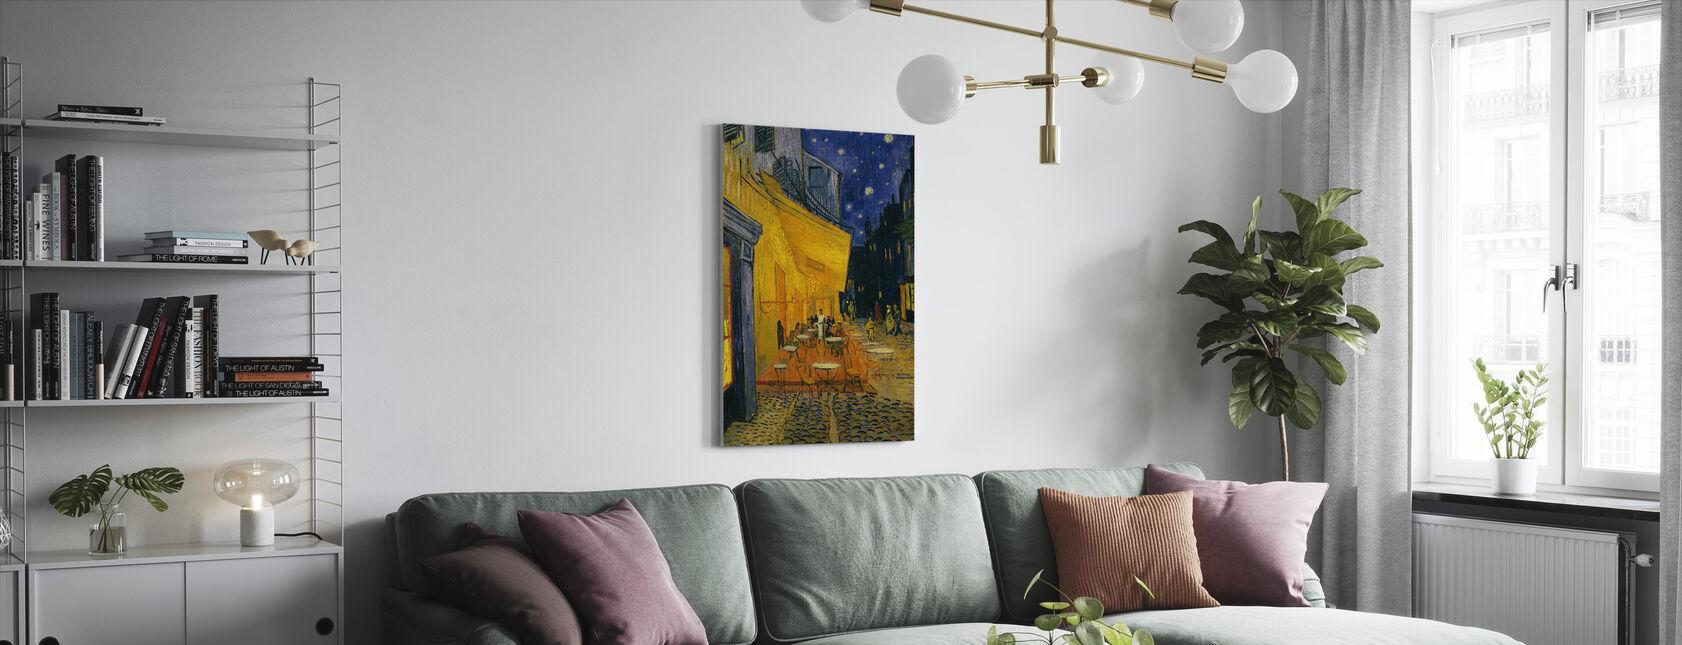 Cafe Terrace - Vincent van Gogh - Leinwandbild - Wohnzimmer